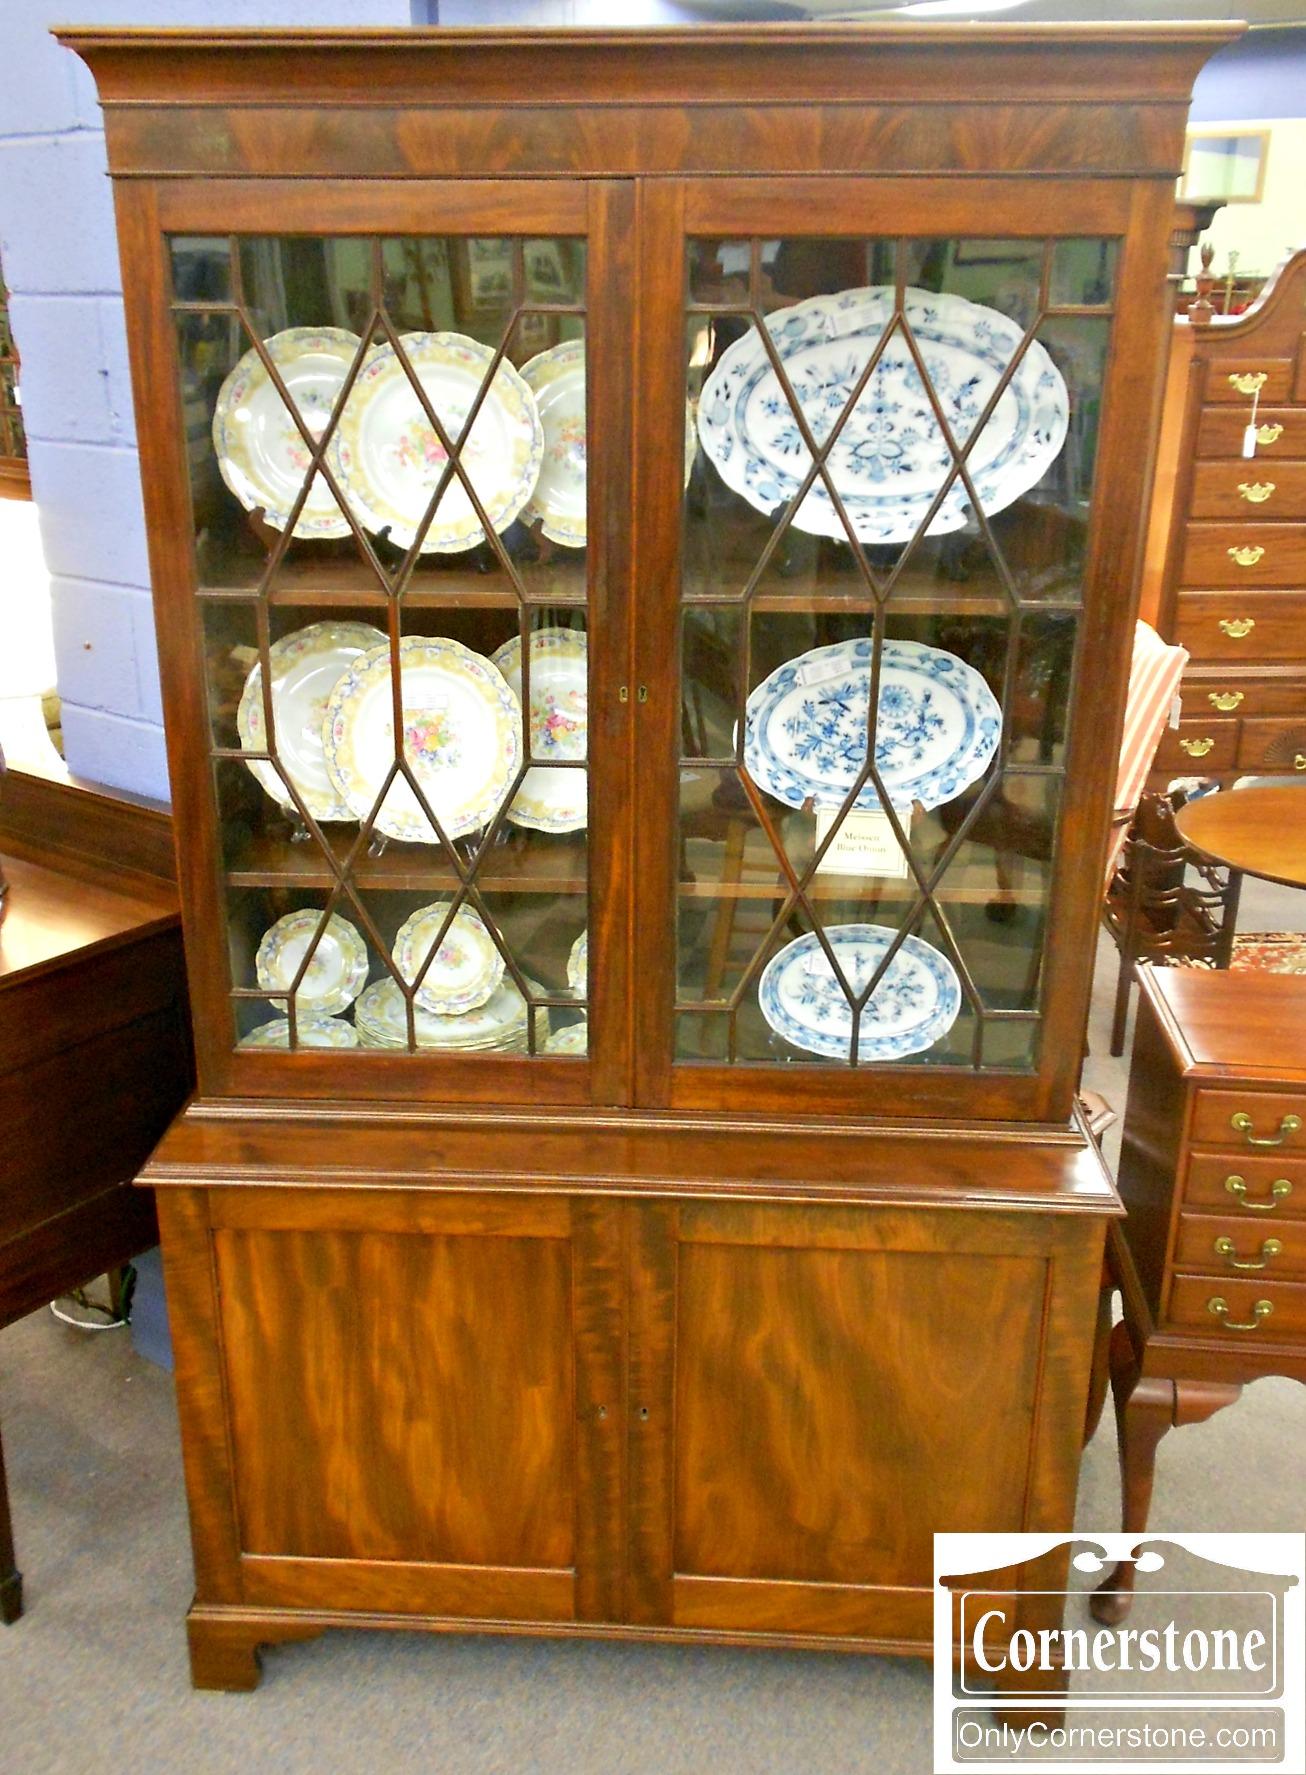 5670-790 Mahogany Antique English Bookcase Cupboard